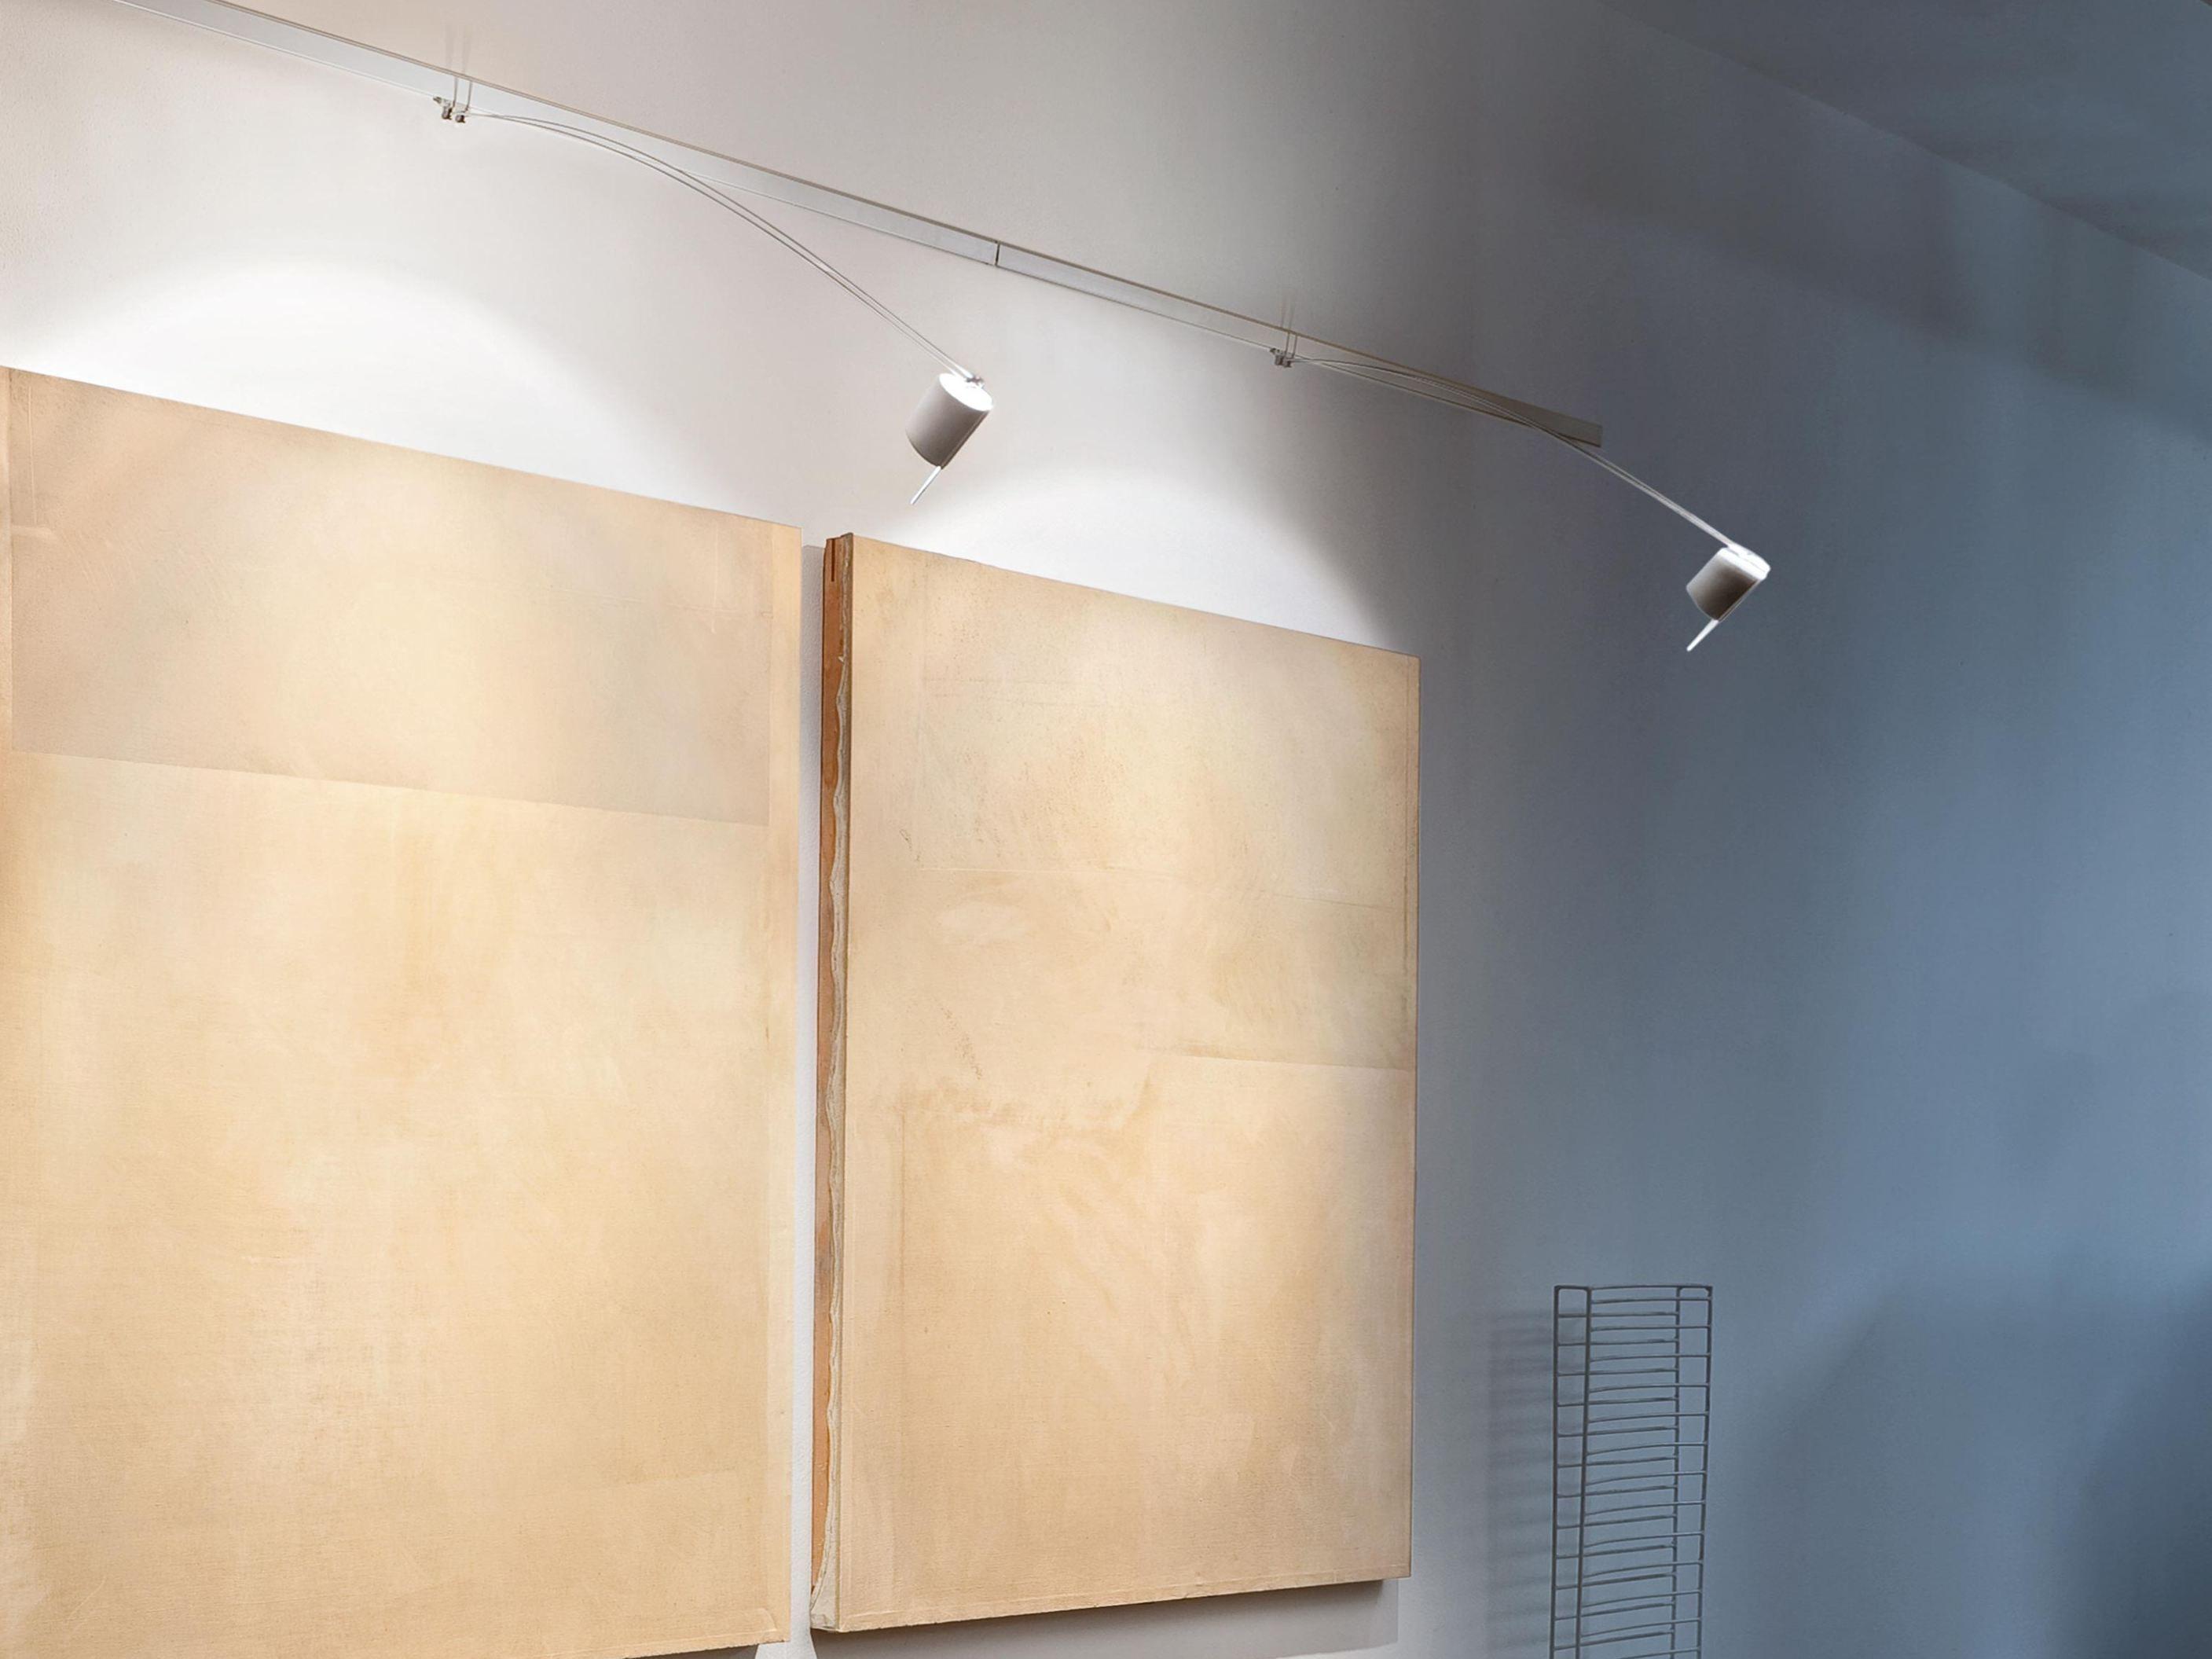 Lampade flos design belle ed efficienti lampade